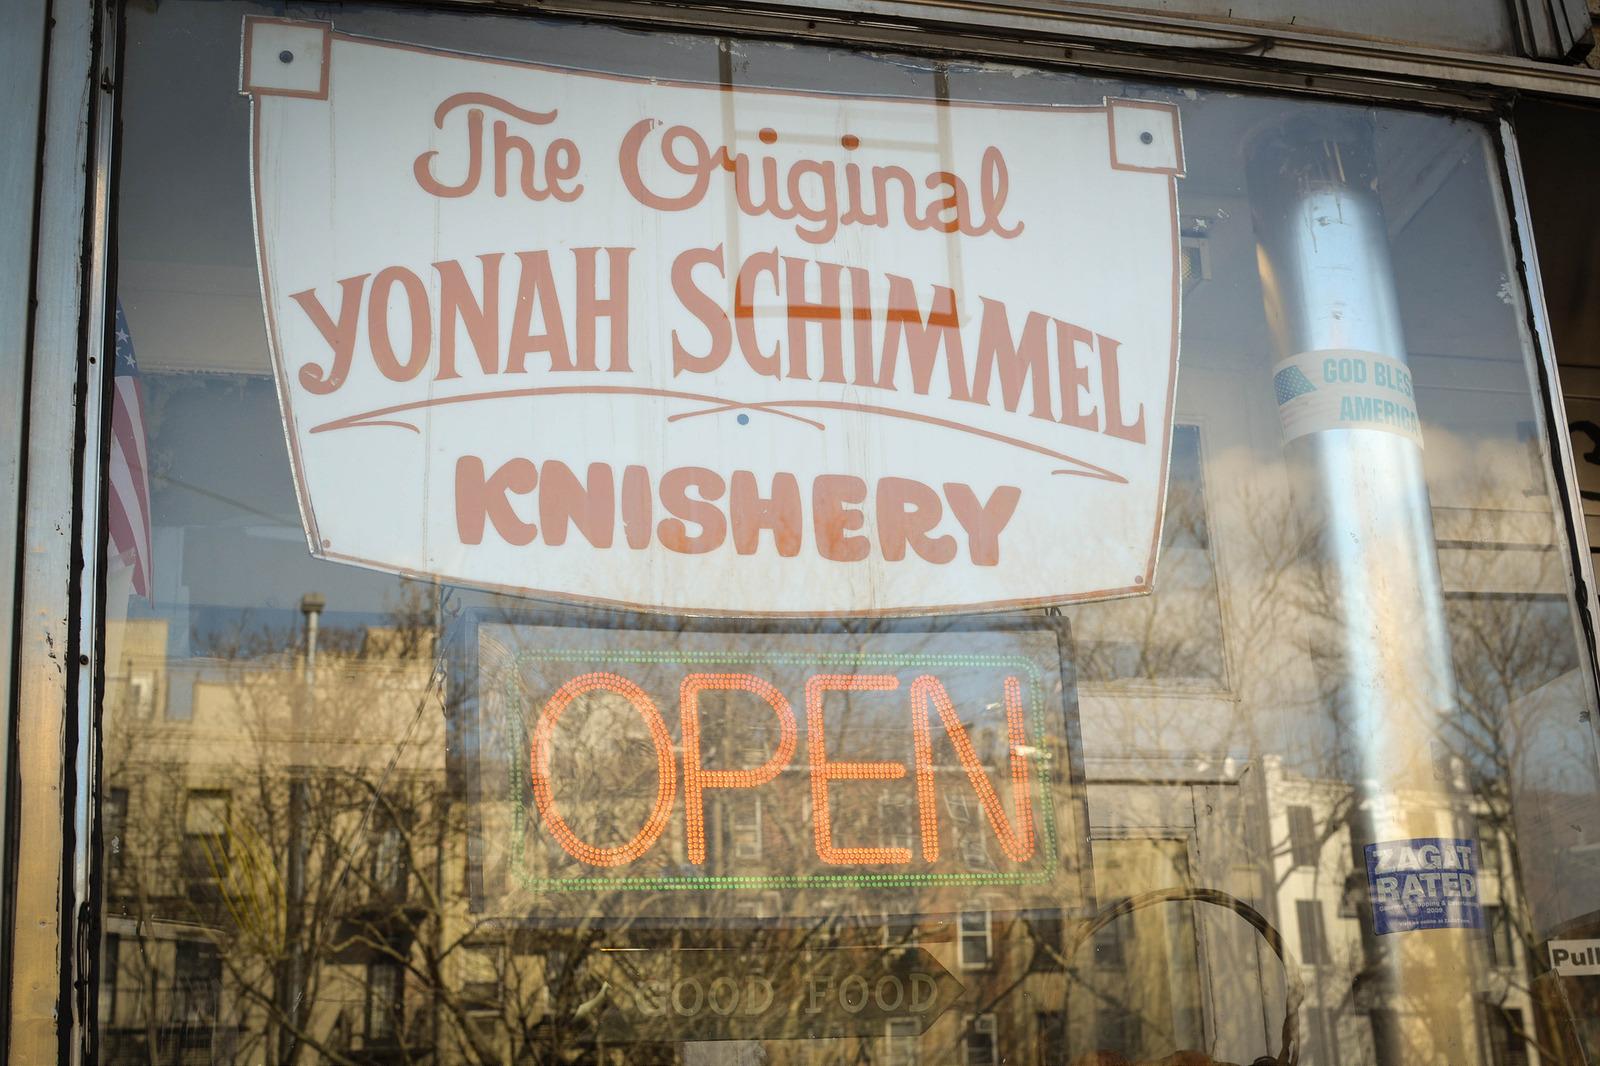 Yonah Schimmel Knishery, New York